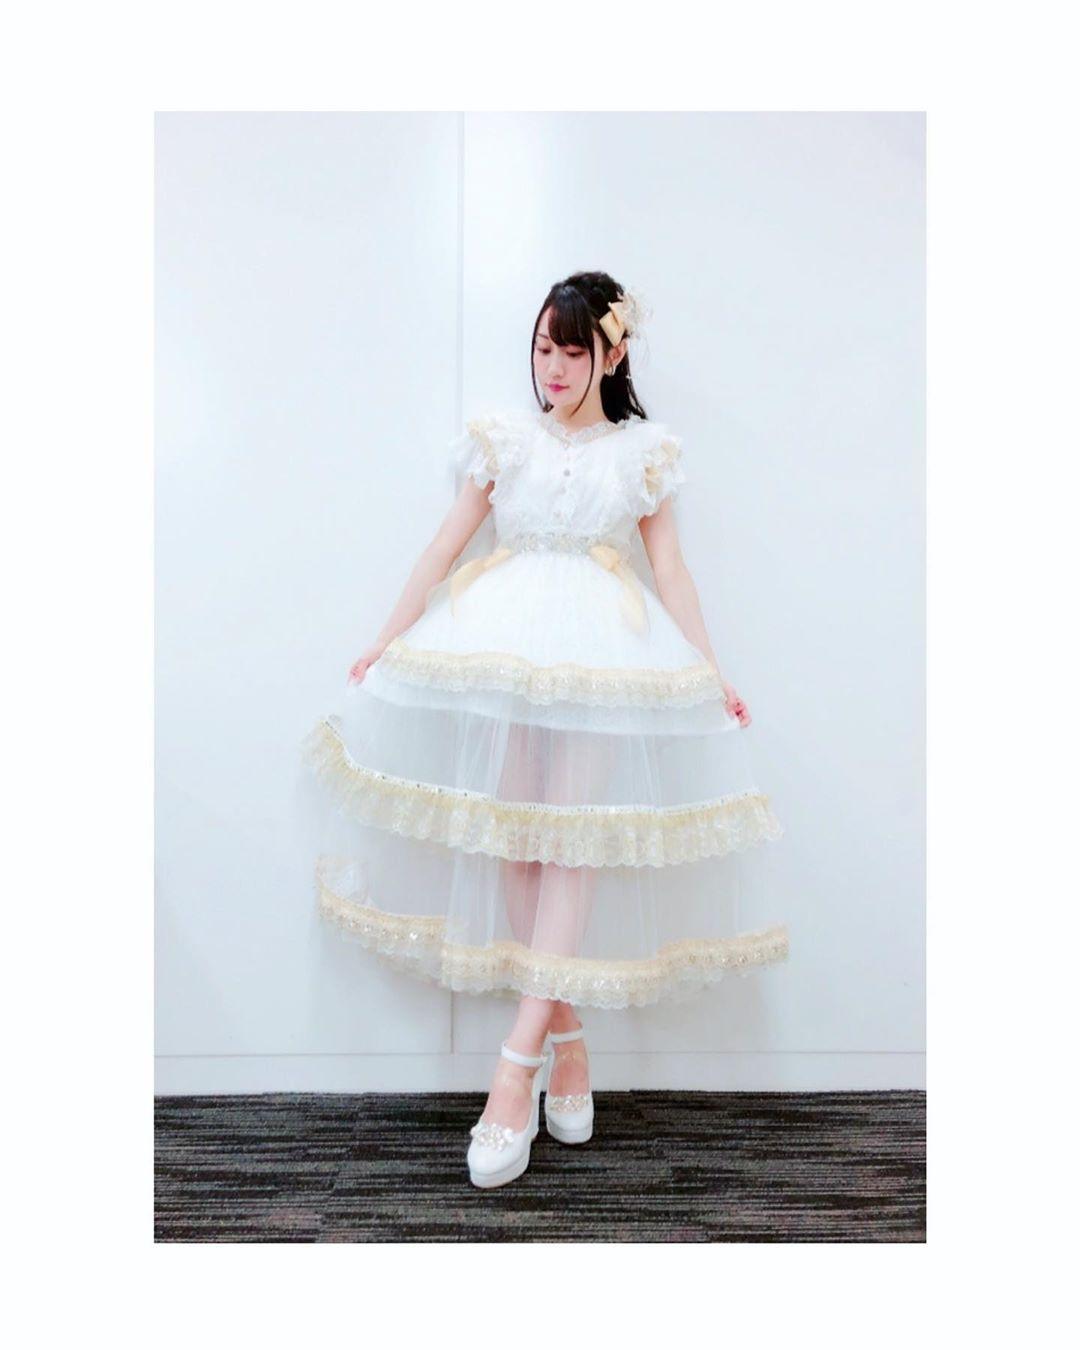 ogura_yui049.jpg